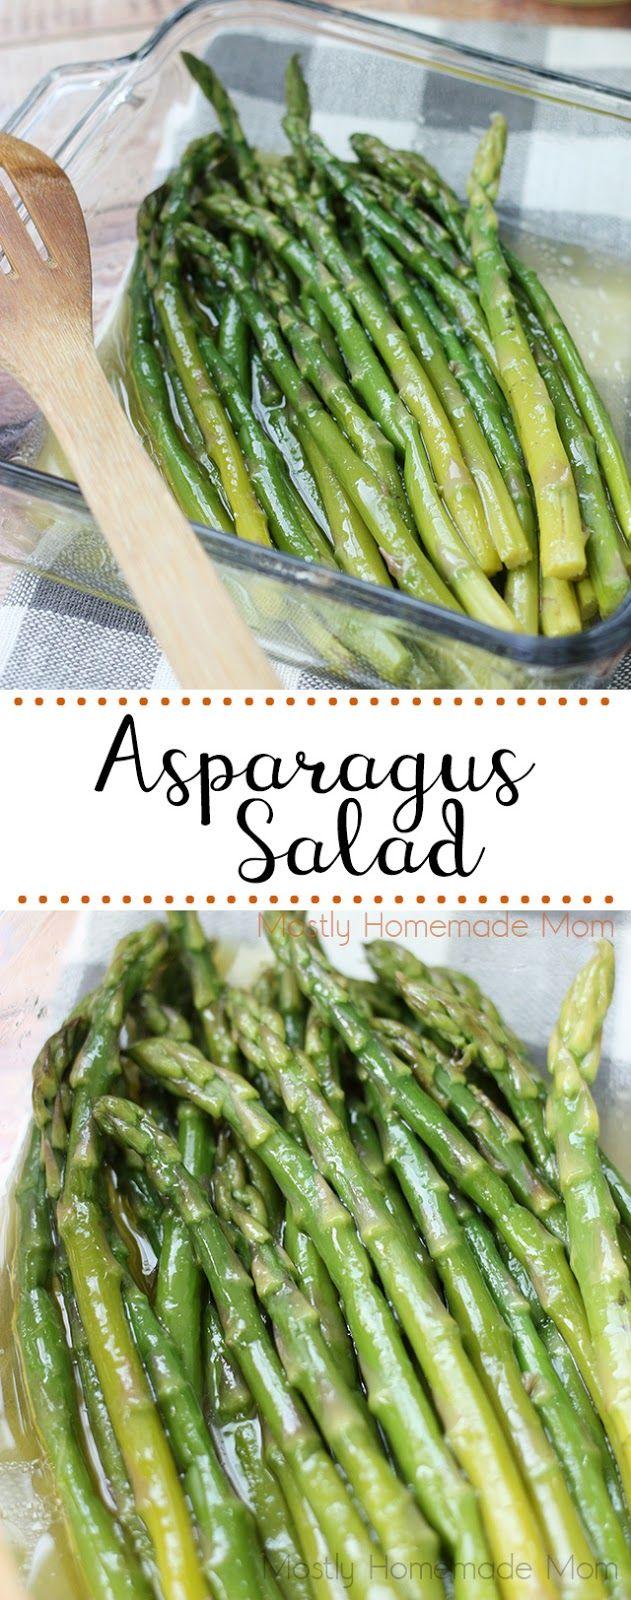 Asparagus Salad - so delicious! Steamed asparagus with a apple cider vinaigrette, yum!